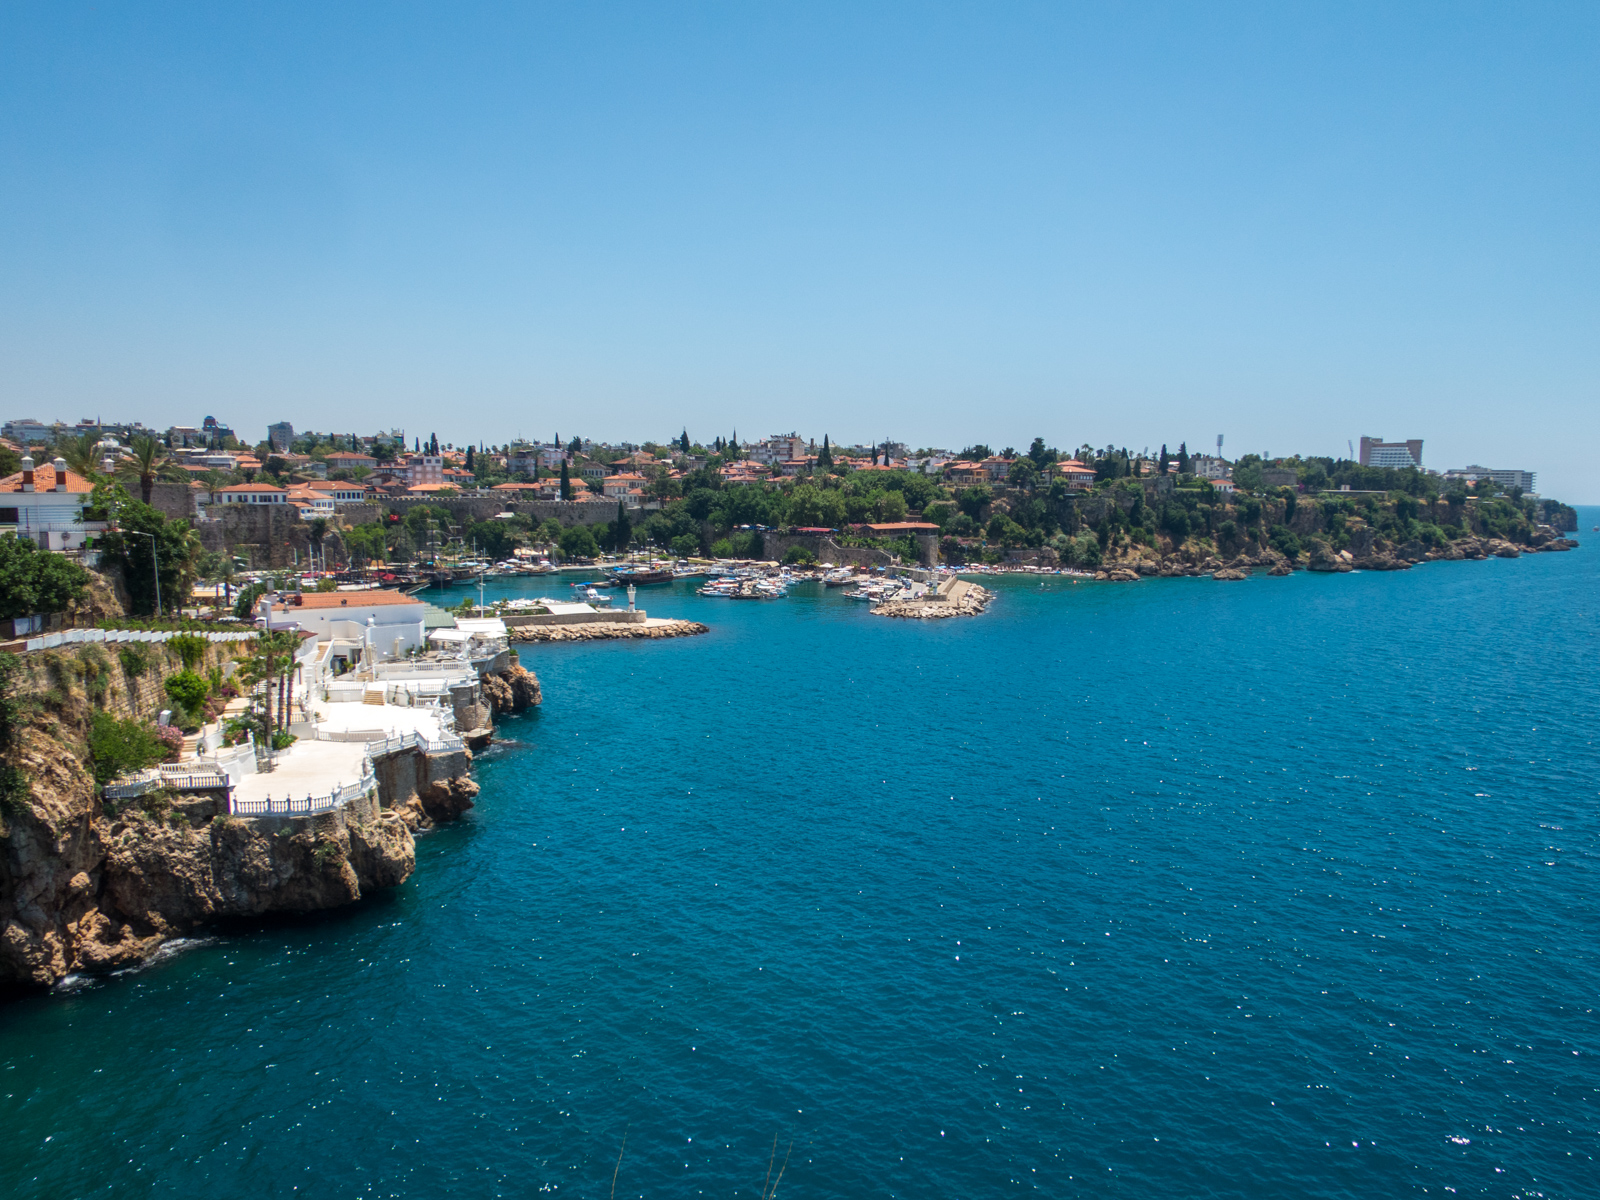 Antalya's ancient city and port